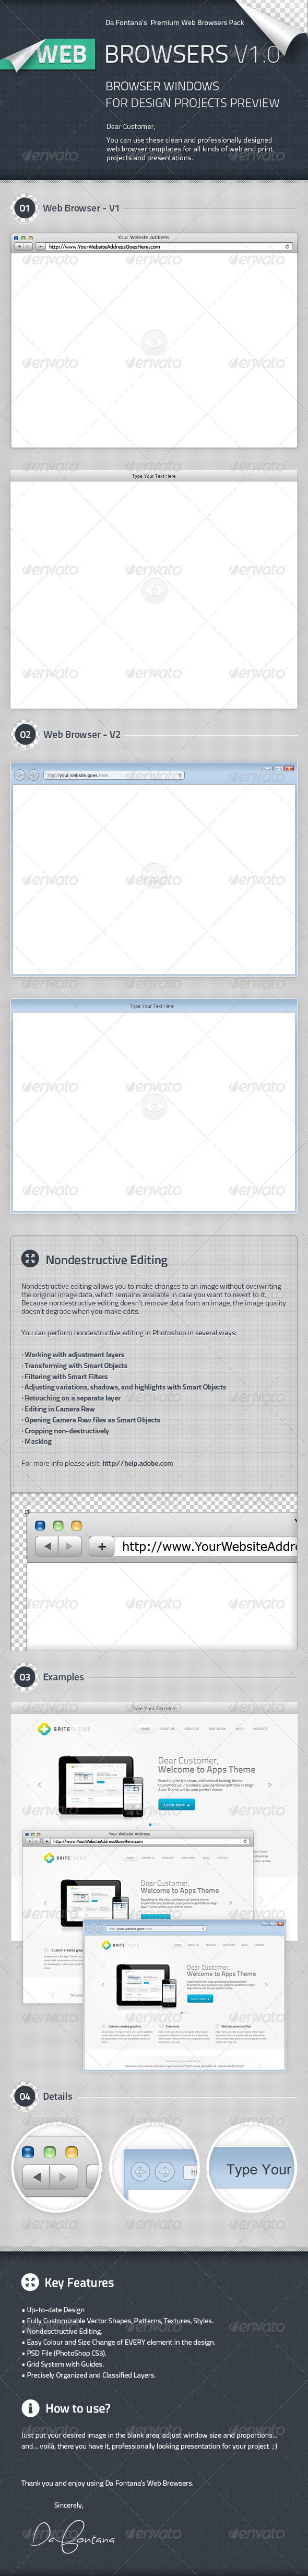 GraphicRiver Web Browser Templates 2350664